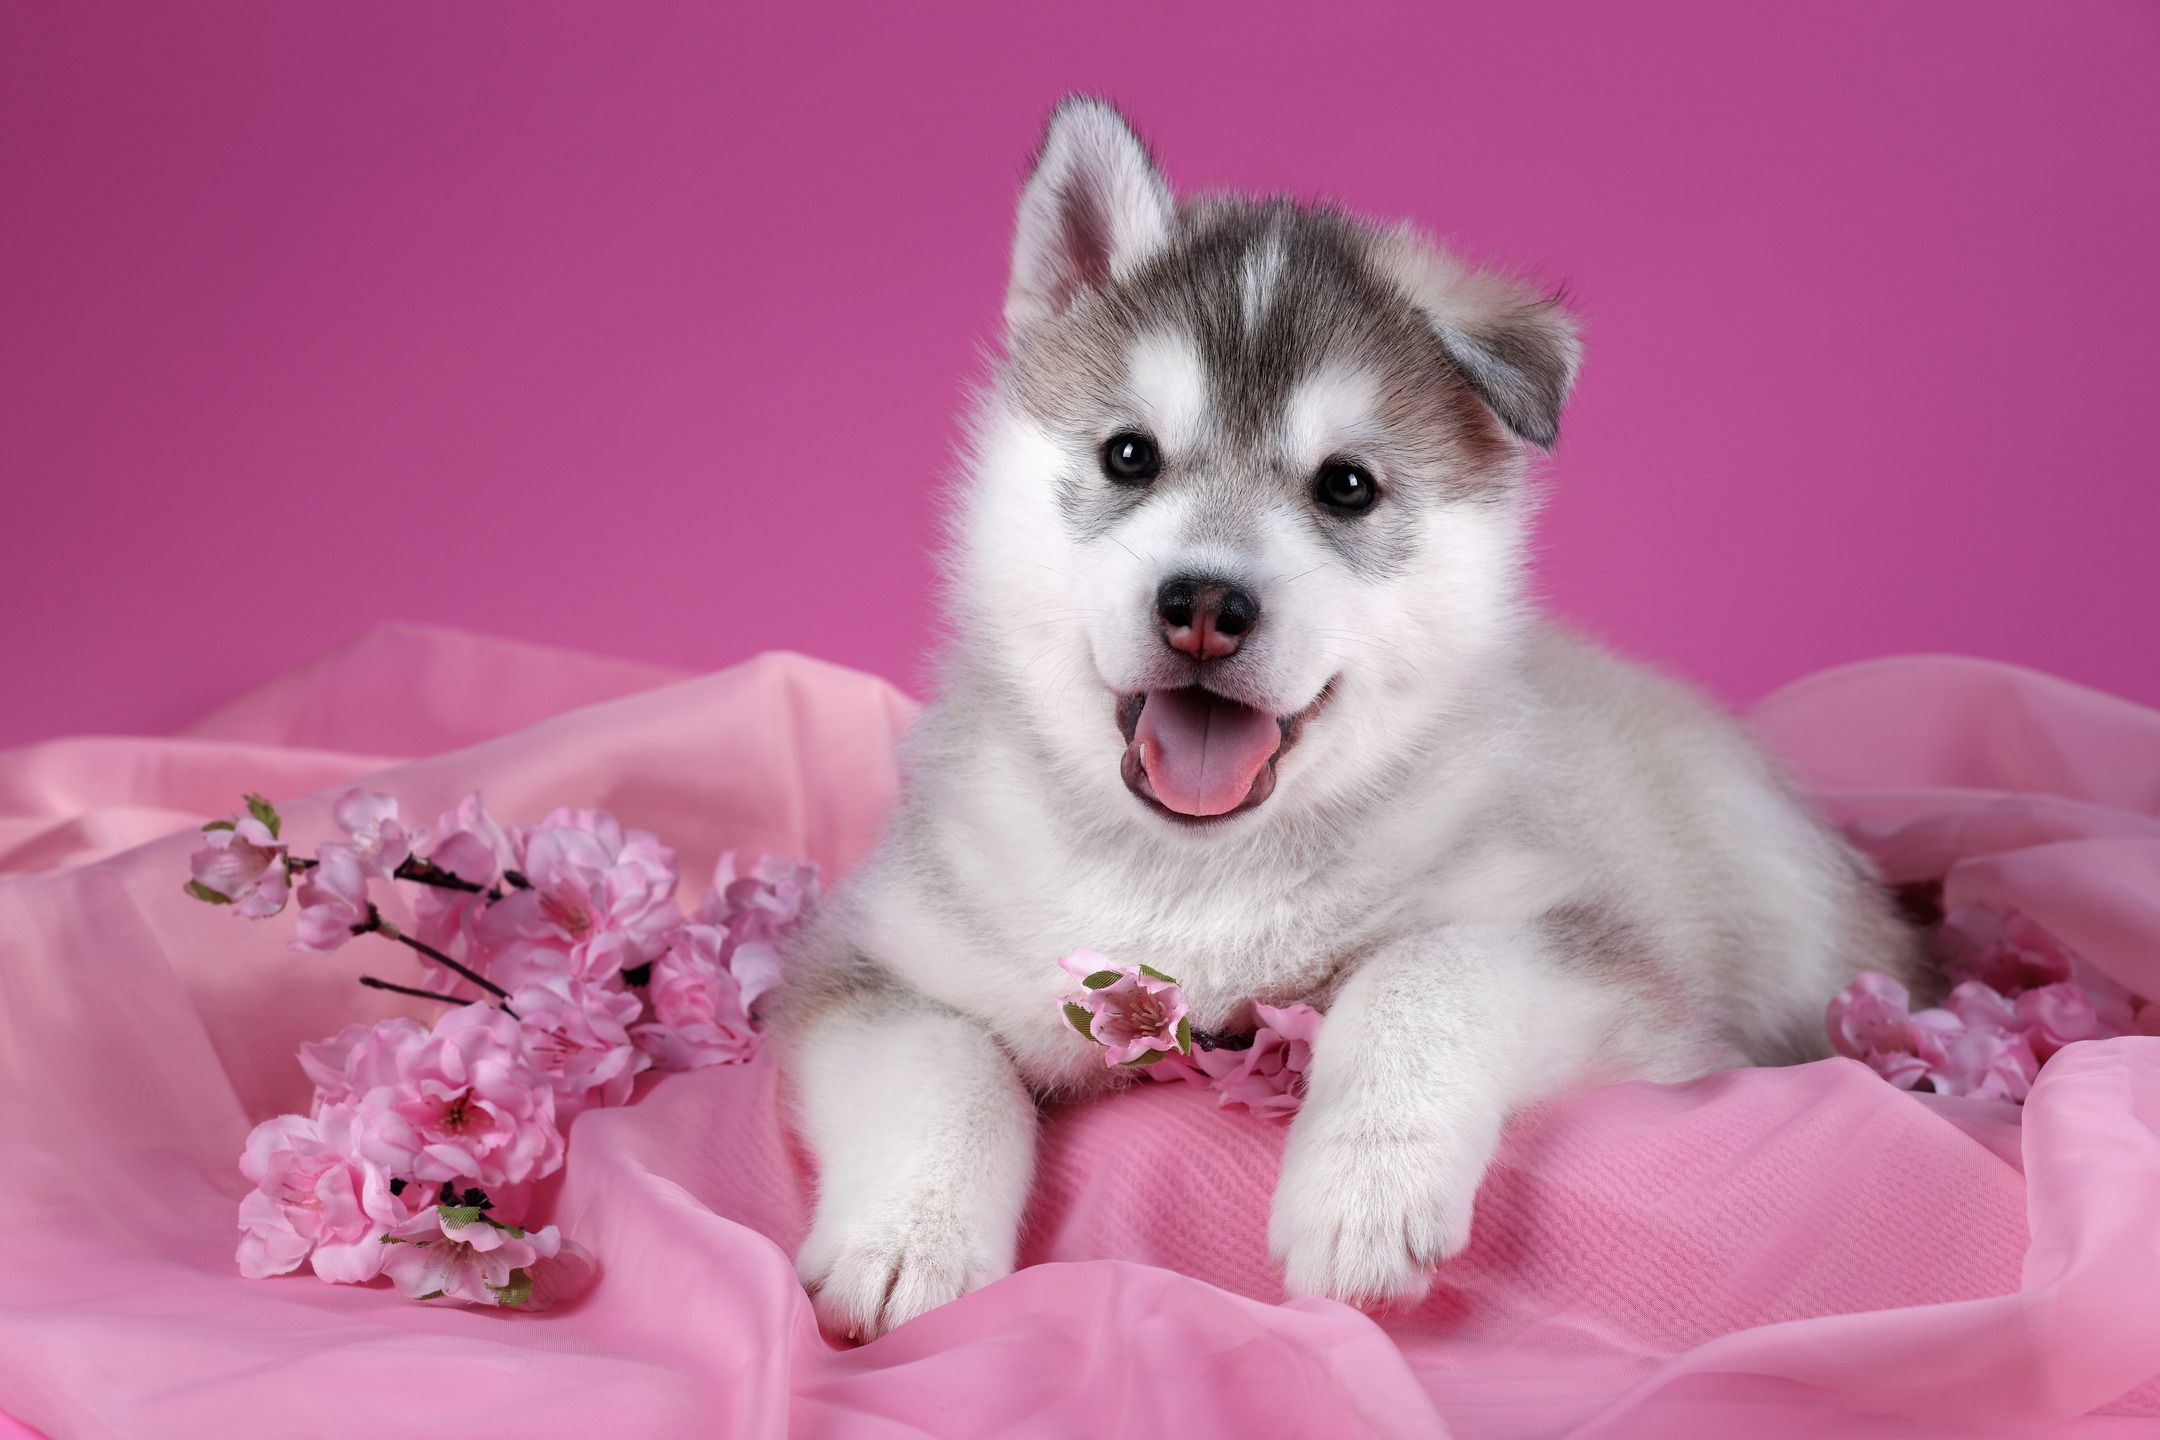 Siberian Husky Puppy On A Pink Background Puppy Backgrounds Husky Puppy Siberian Husky Puppy